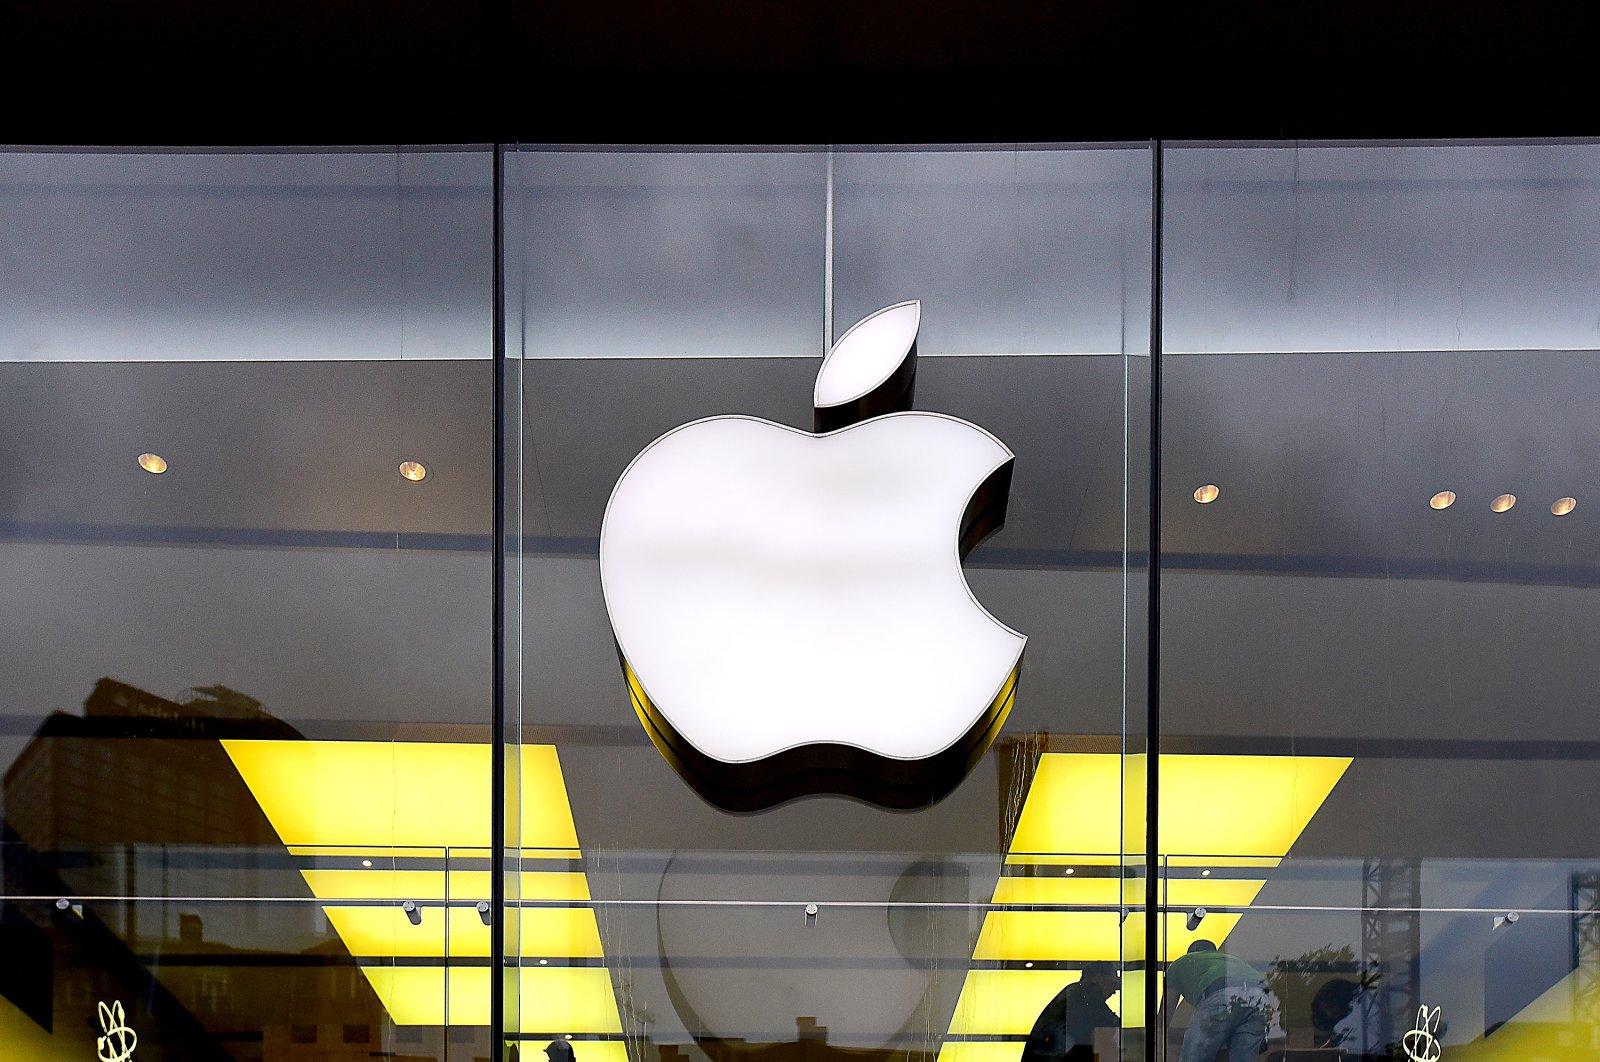 Apple logo seen on the company's store in Frankfurt, Germany, May 8, 2017. (Shutterstock Photo)